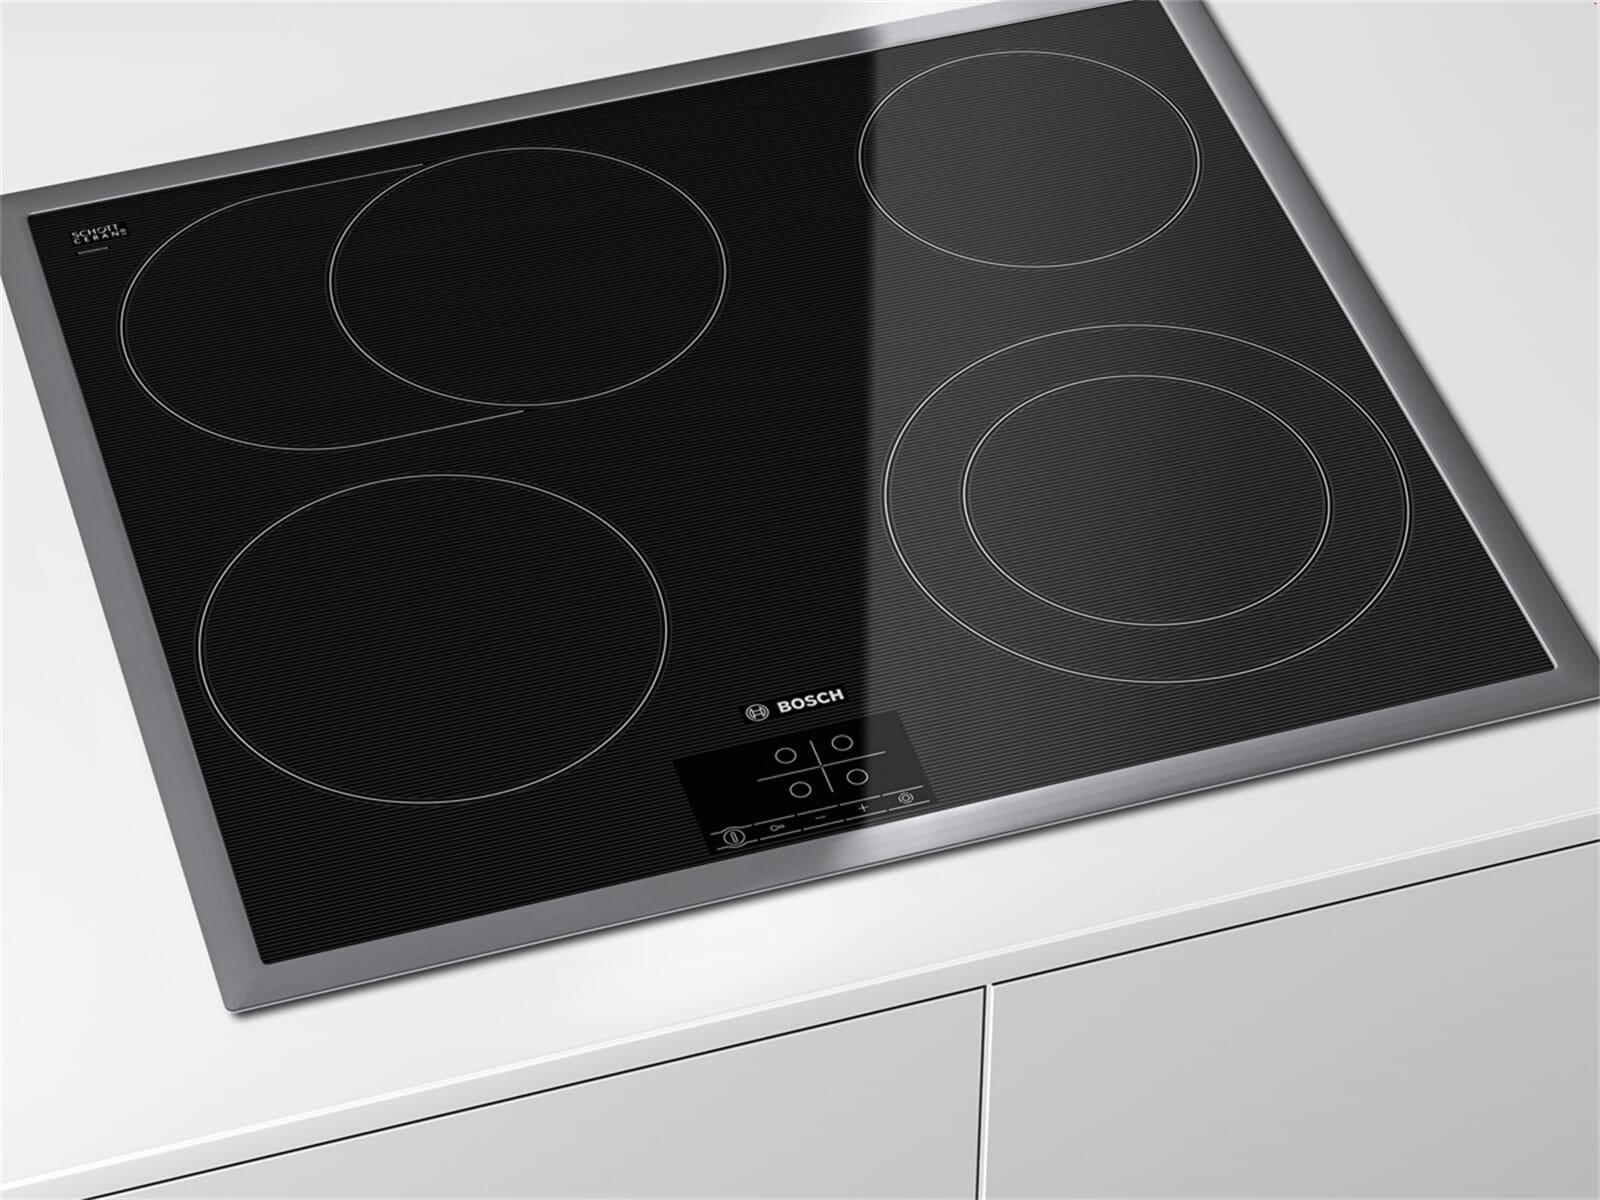 bosch pkn645d17 glaskeramik kochfeld autark. Black Bedroom Furniture Sets. Home Design Ideas